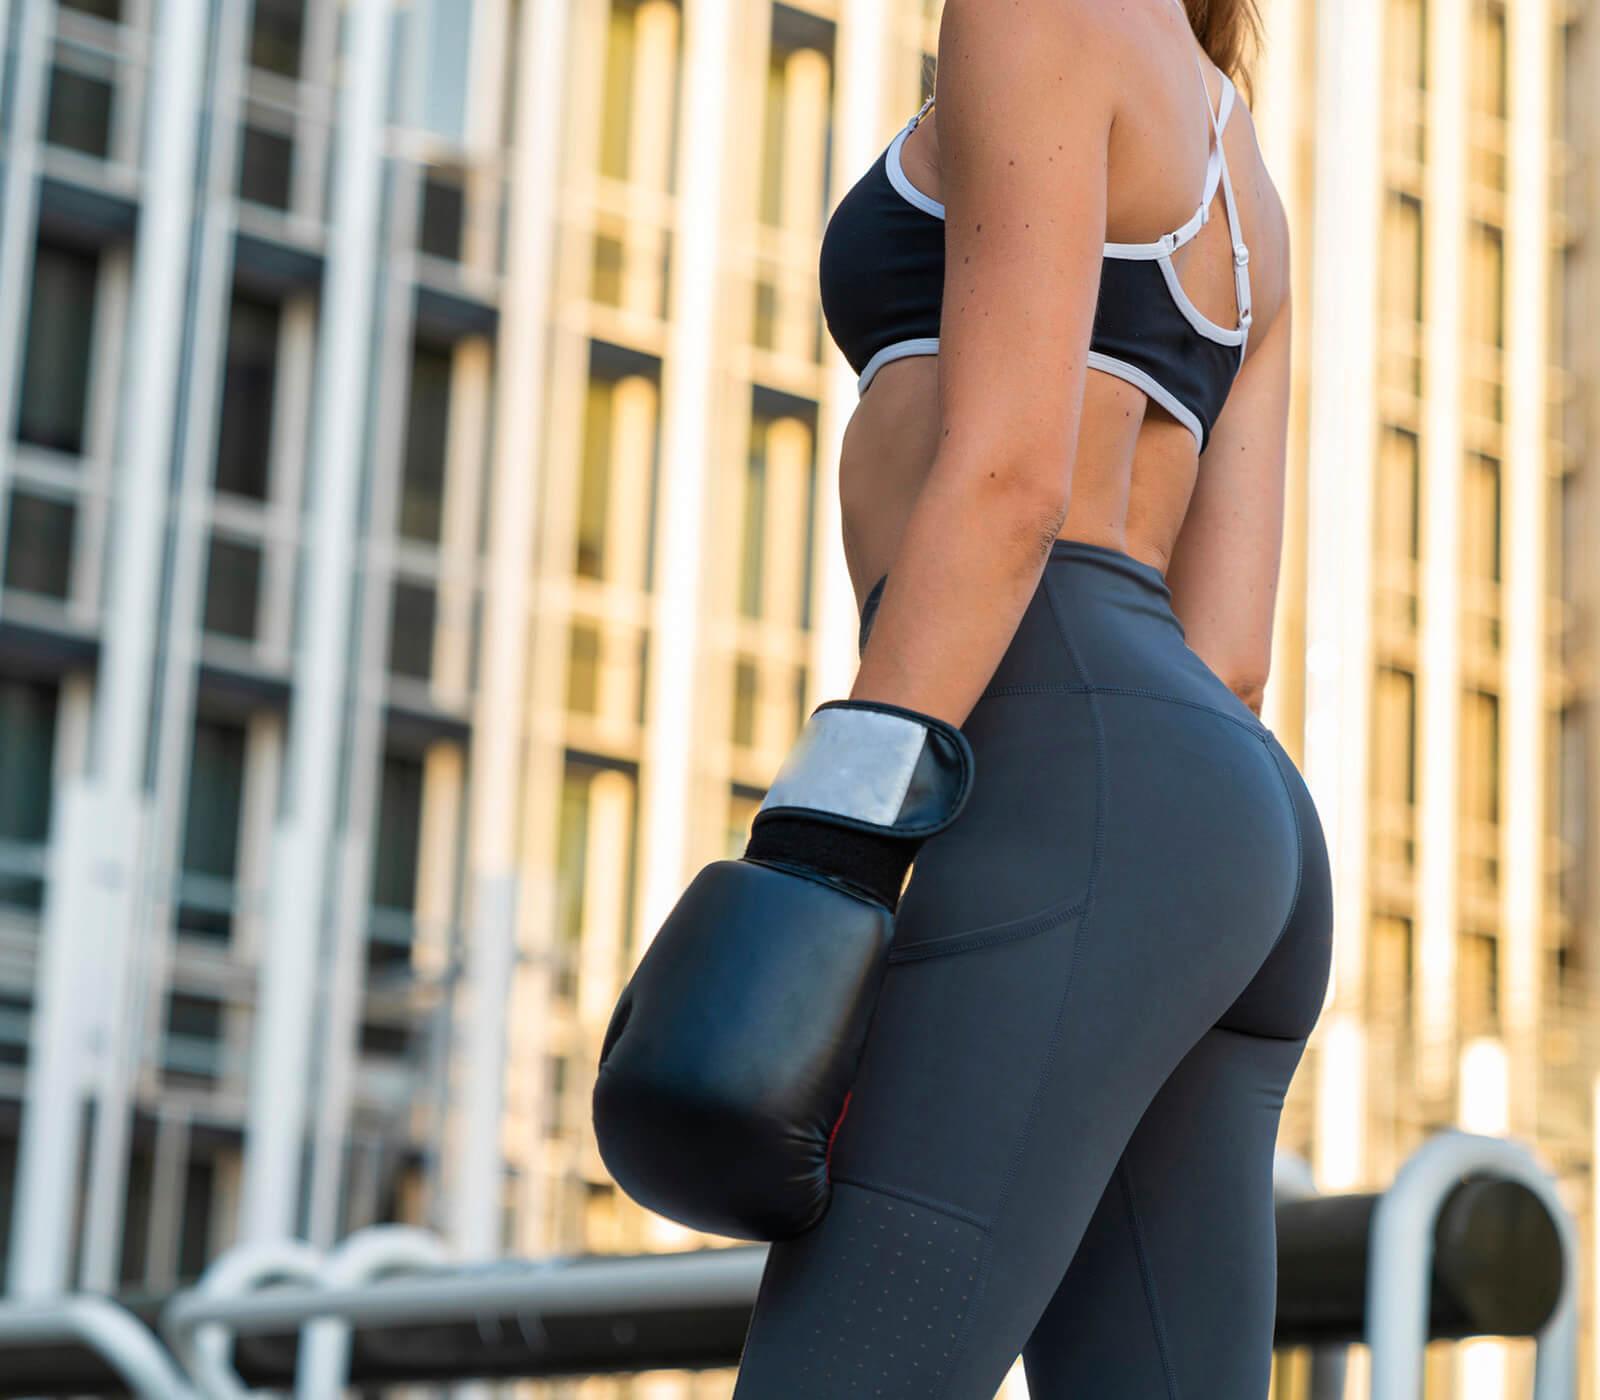 ejercicios-gluteos-sexy-1.jpg